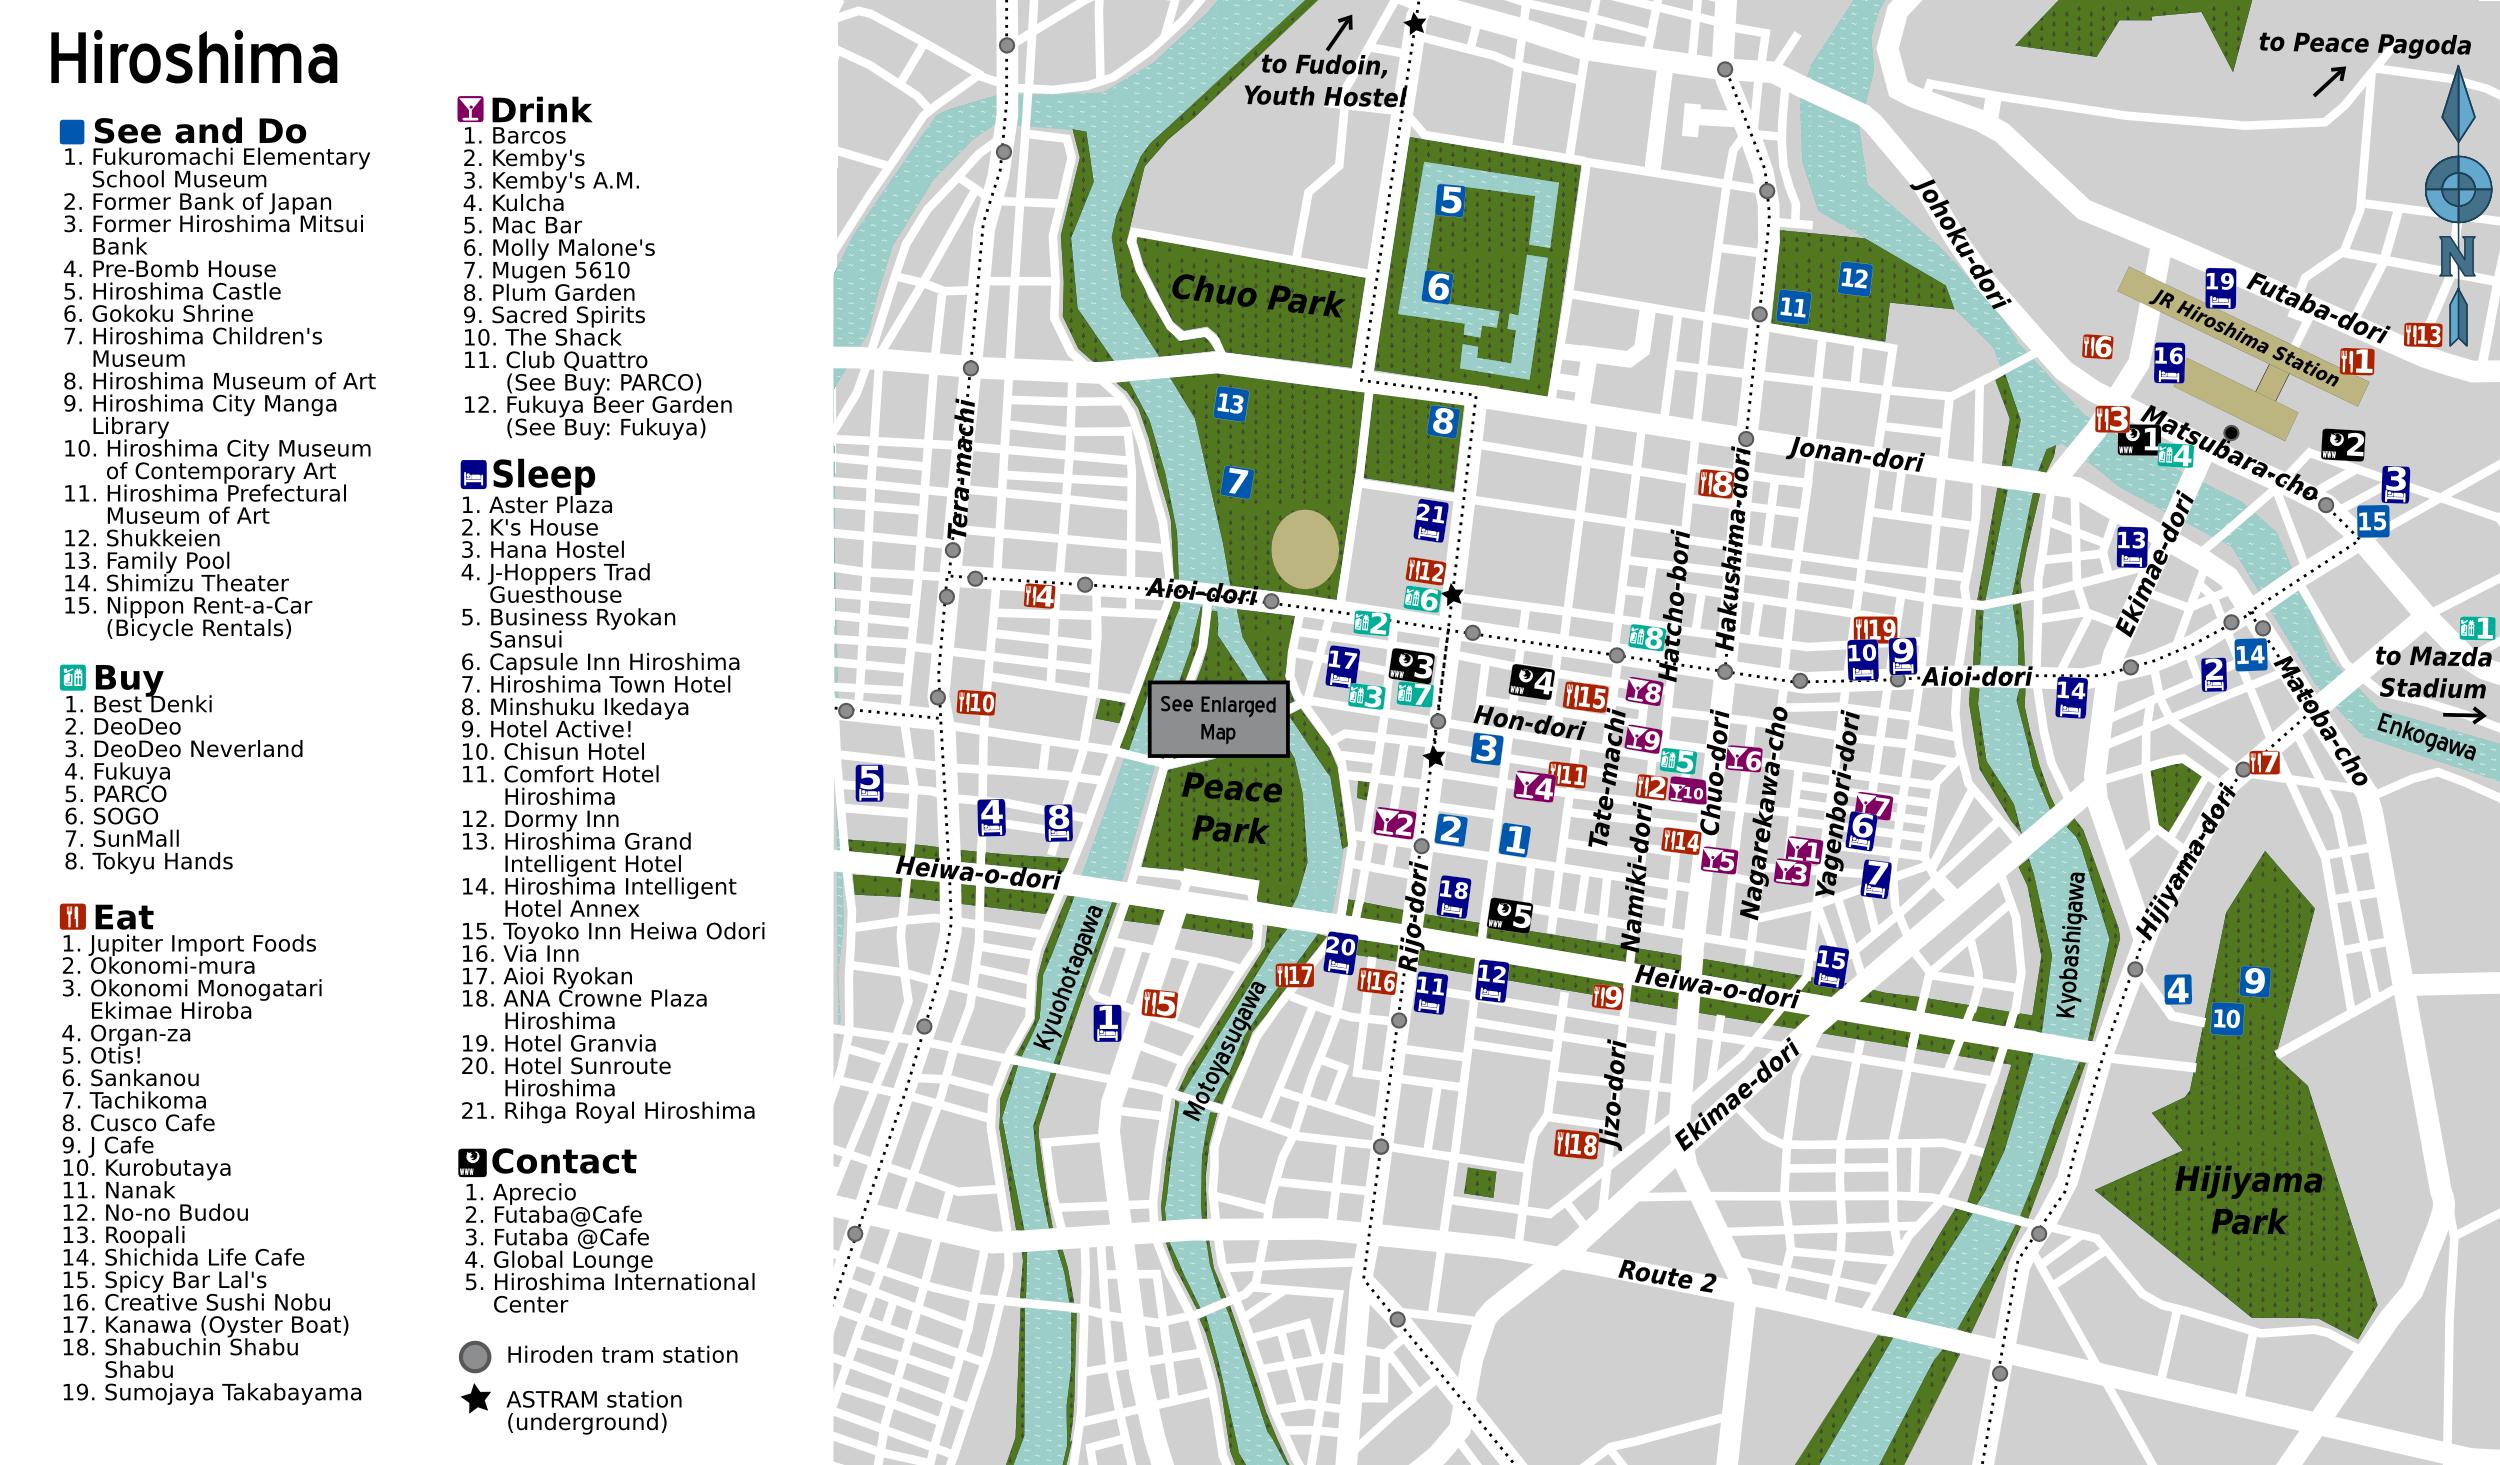 Hiroshima Tourist Map Hiroshima Japan mappery